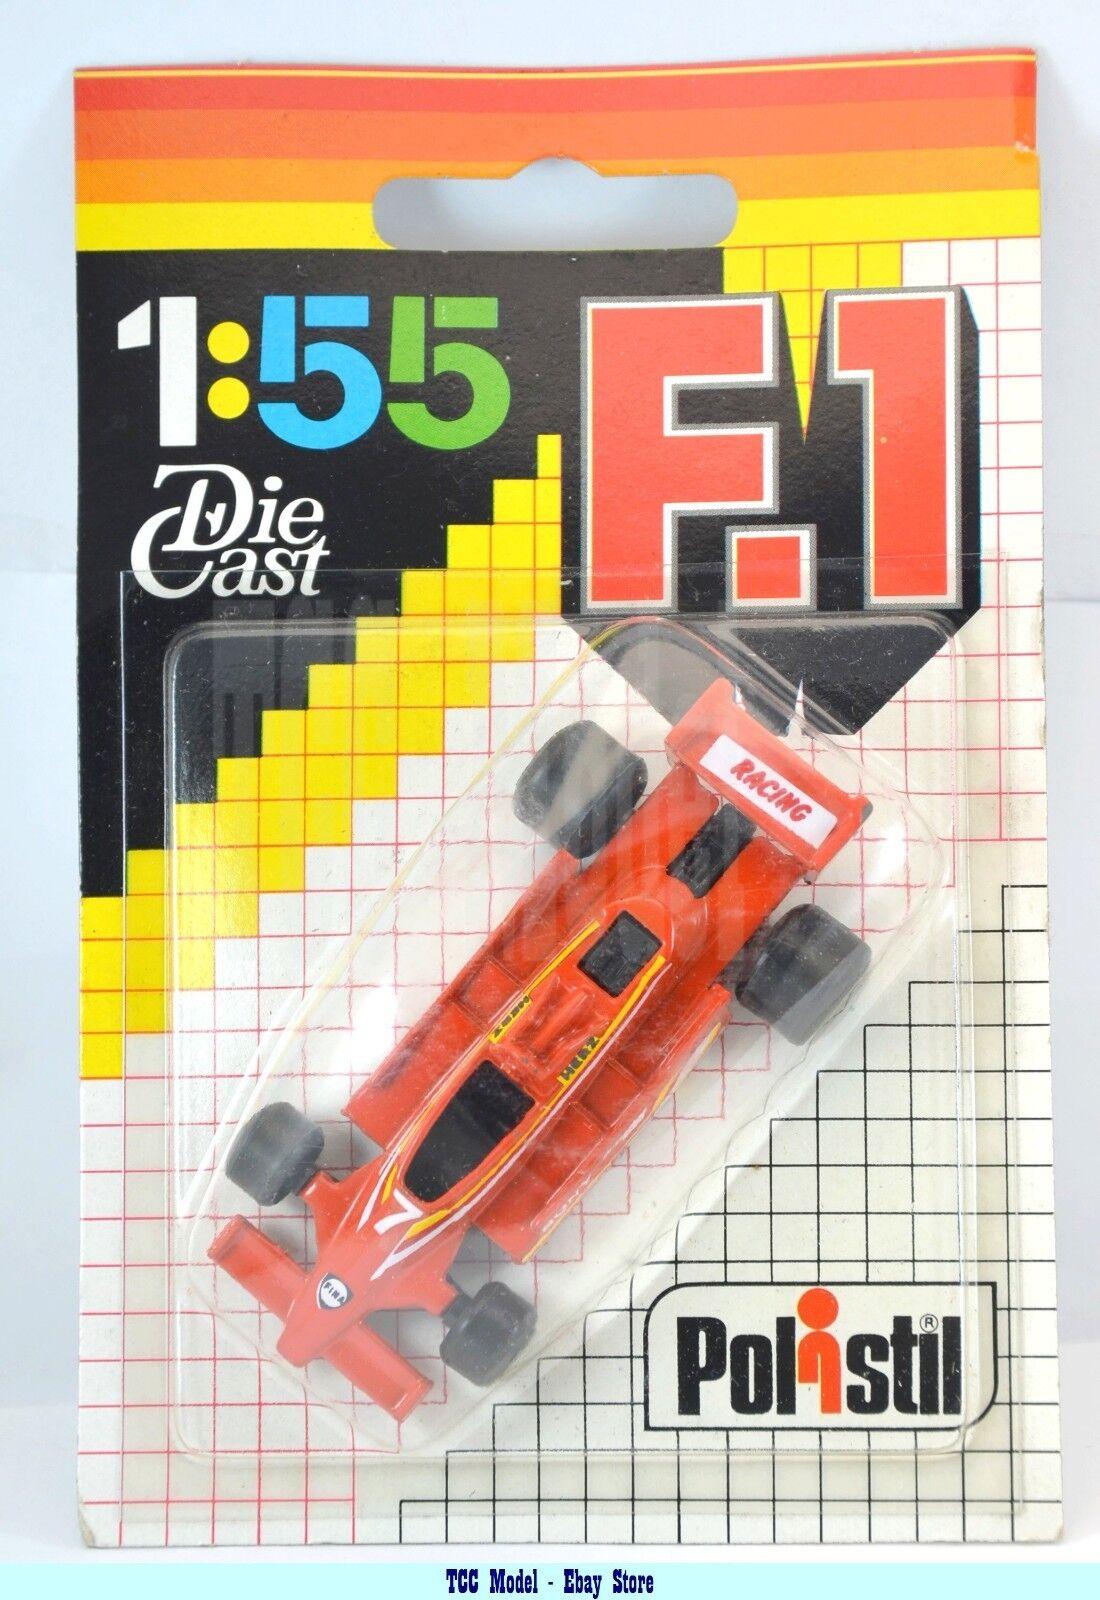 Polistil m0855 f1  1 55 - Tyrrell Racing  7 Orange - In Blister-RARE  votre satisfaction est notre cible